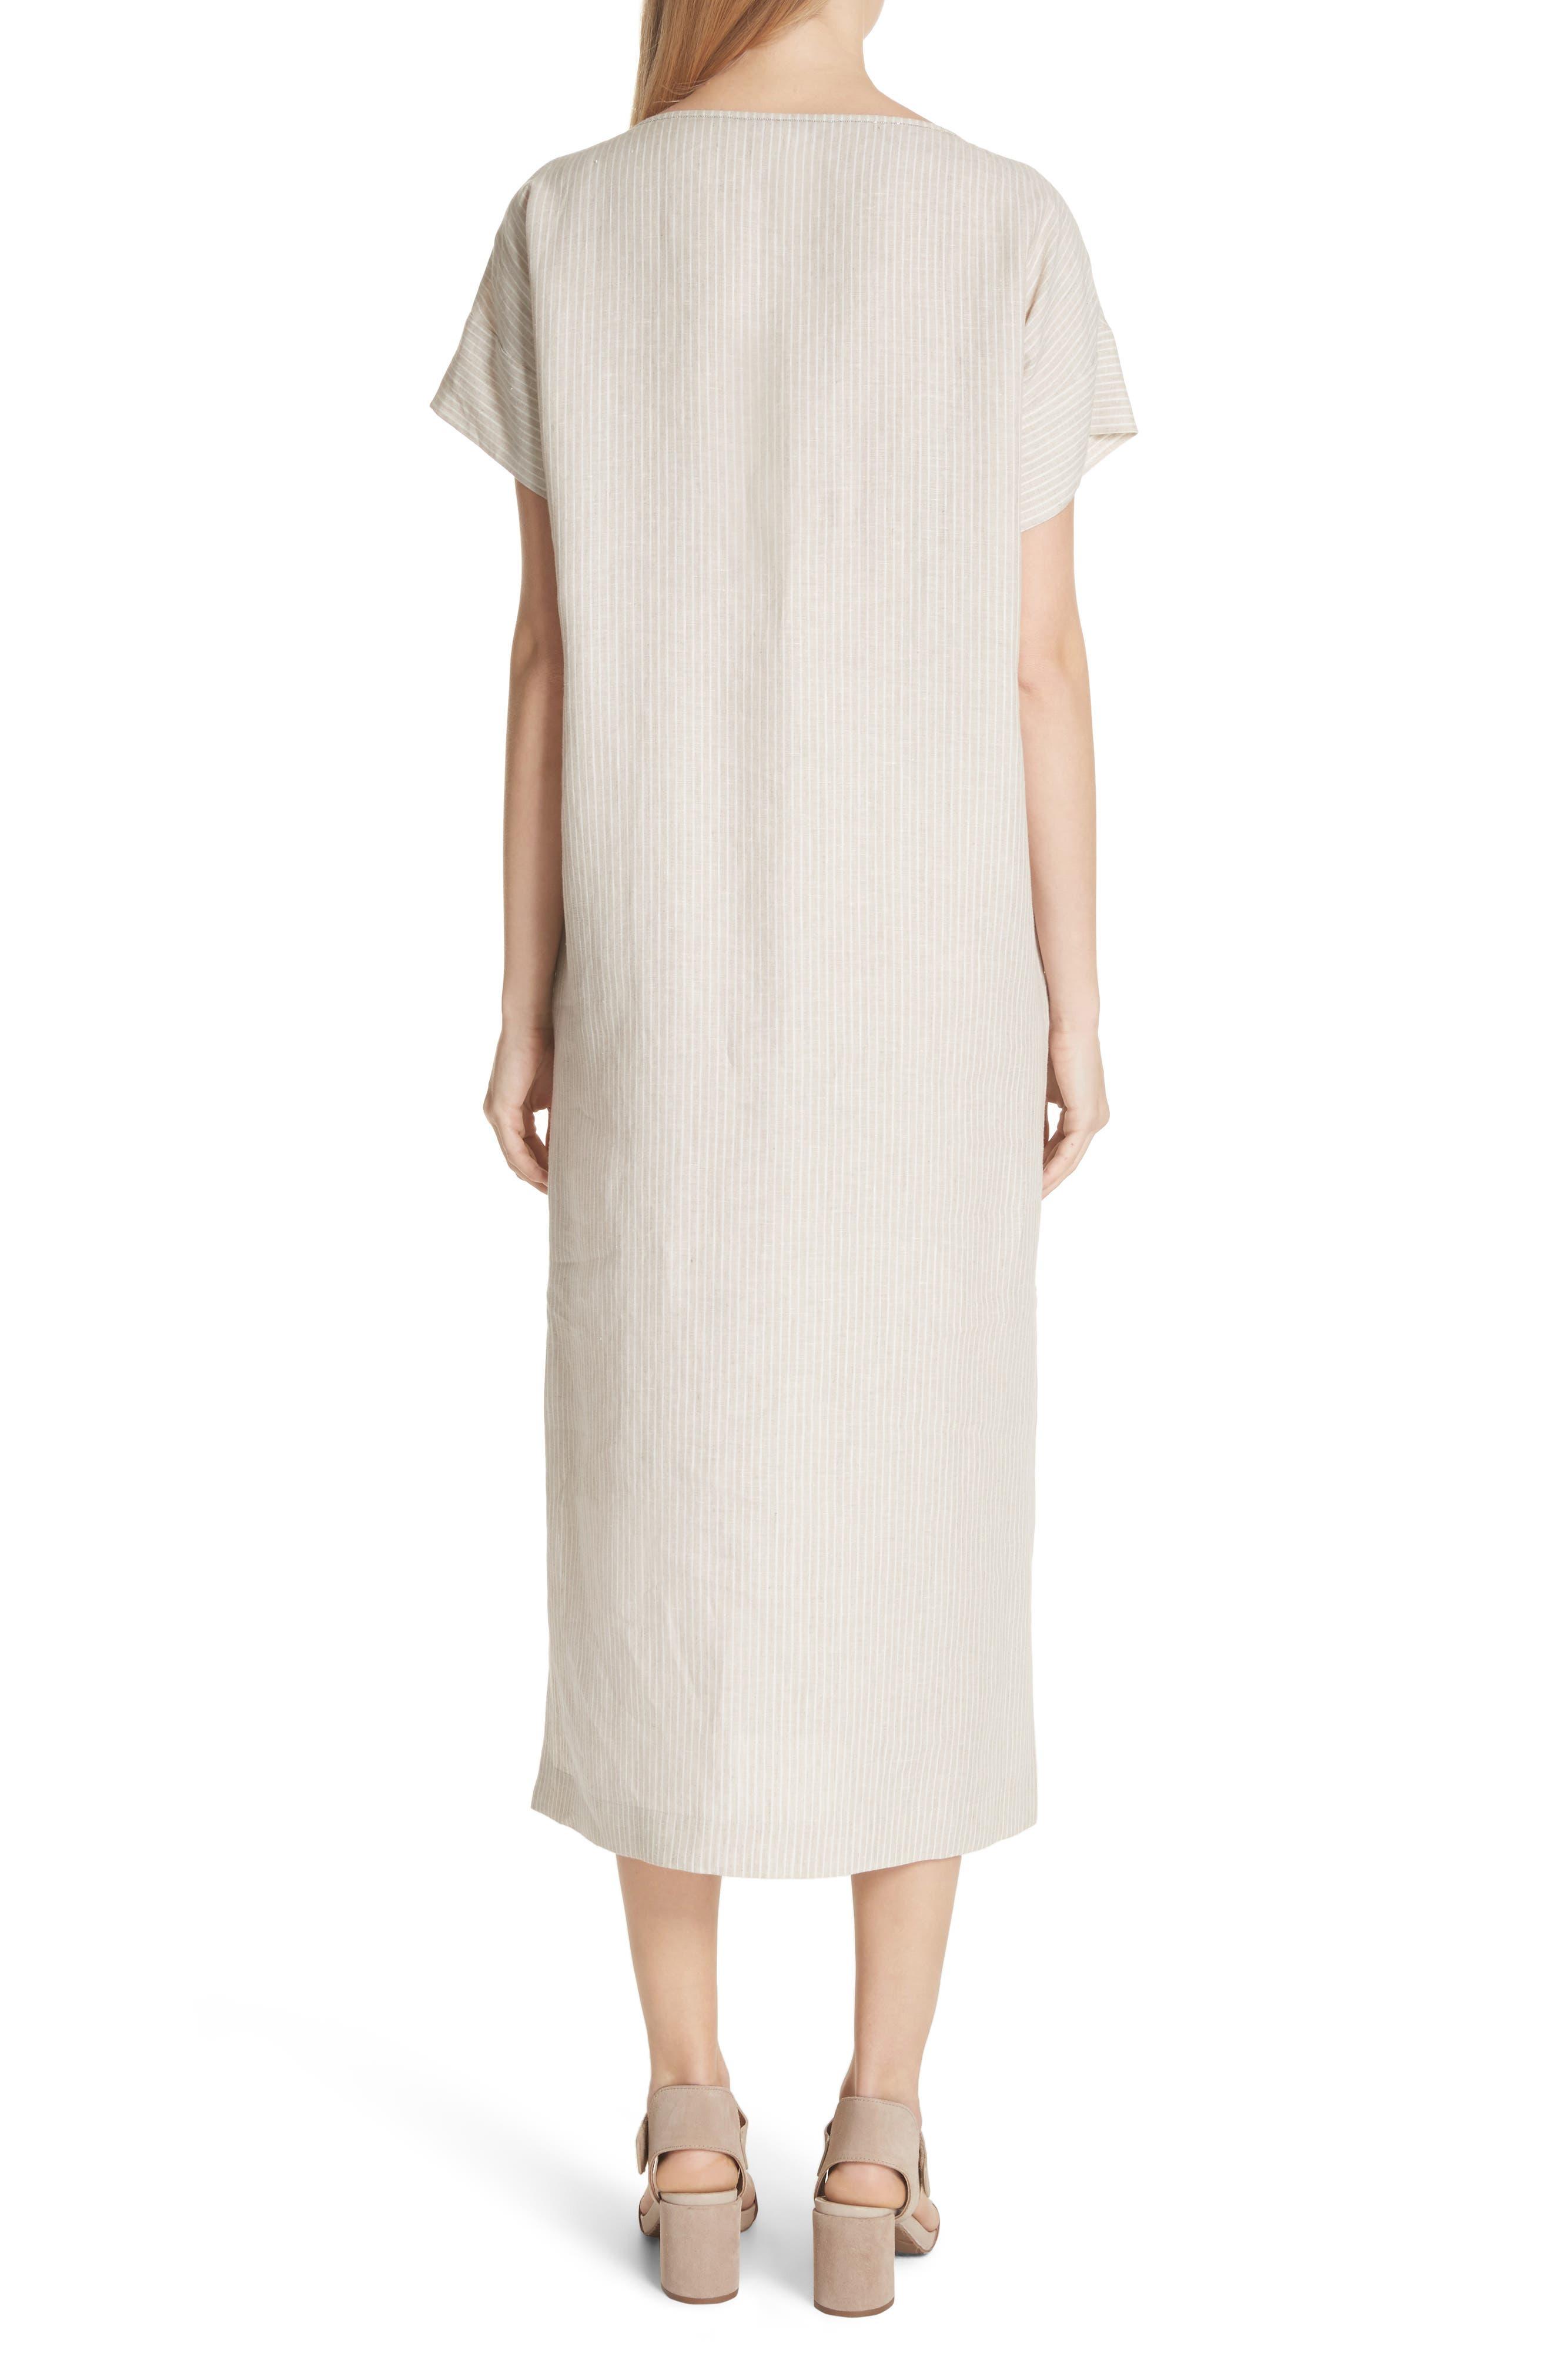 LAFAYETTE 148 NEW YORK,                             Emiline Stripe Linen Dress,                             Alternate thumbnail 2, color,                             251